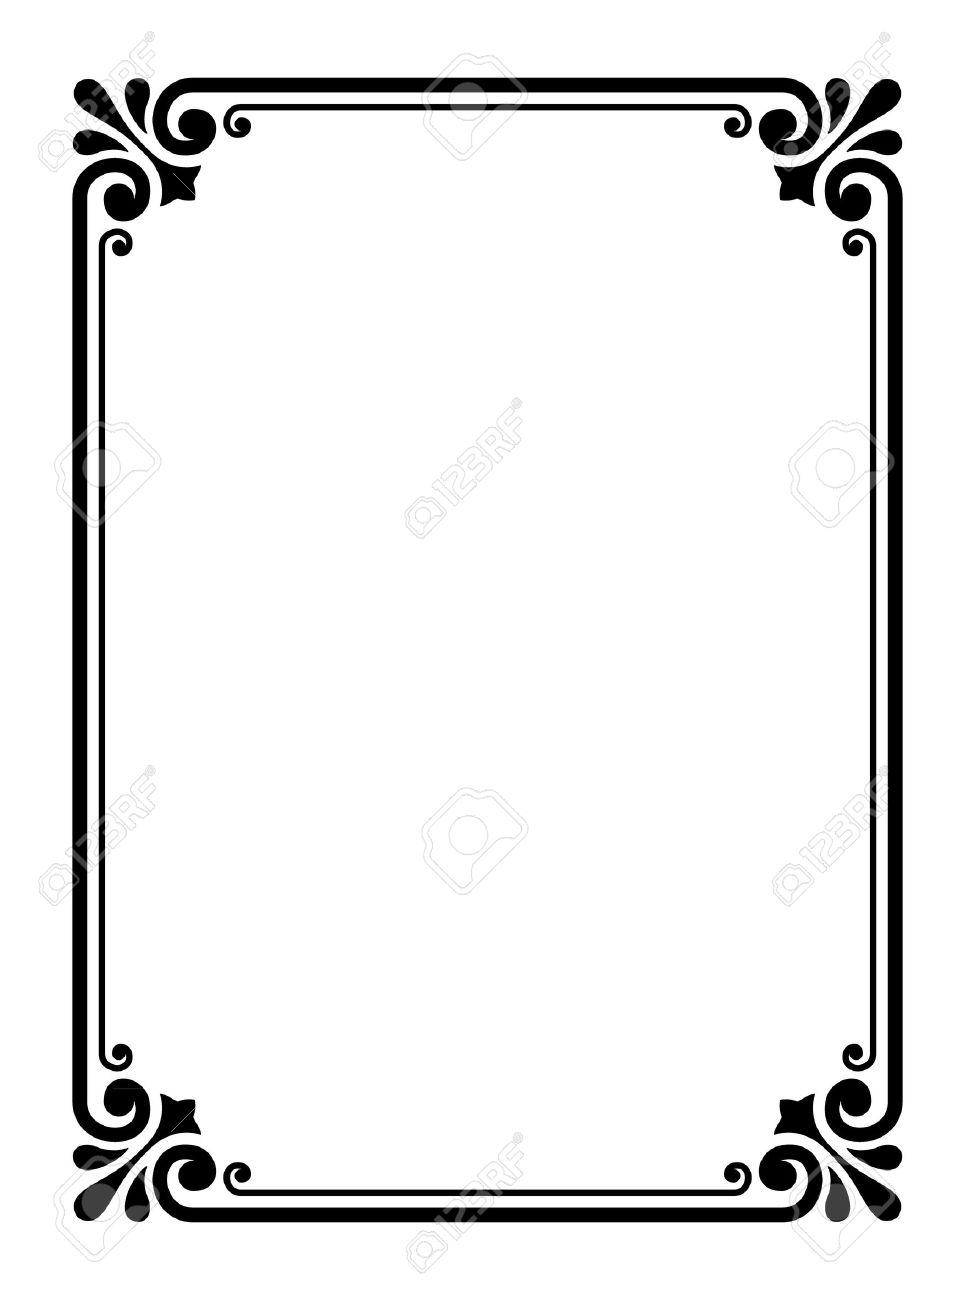 Vector simple calligraph ornamental decorative frame pattern - 11142798